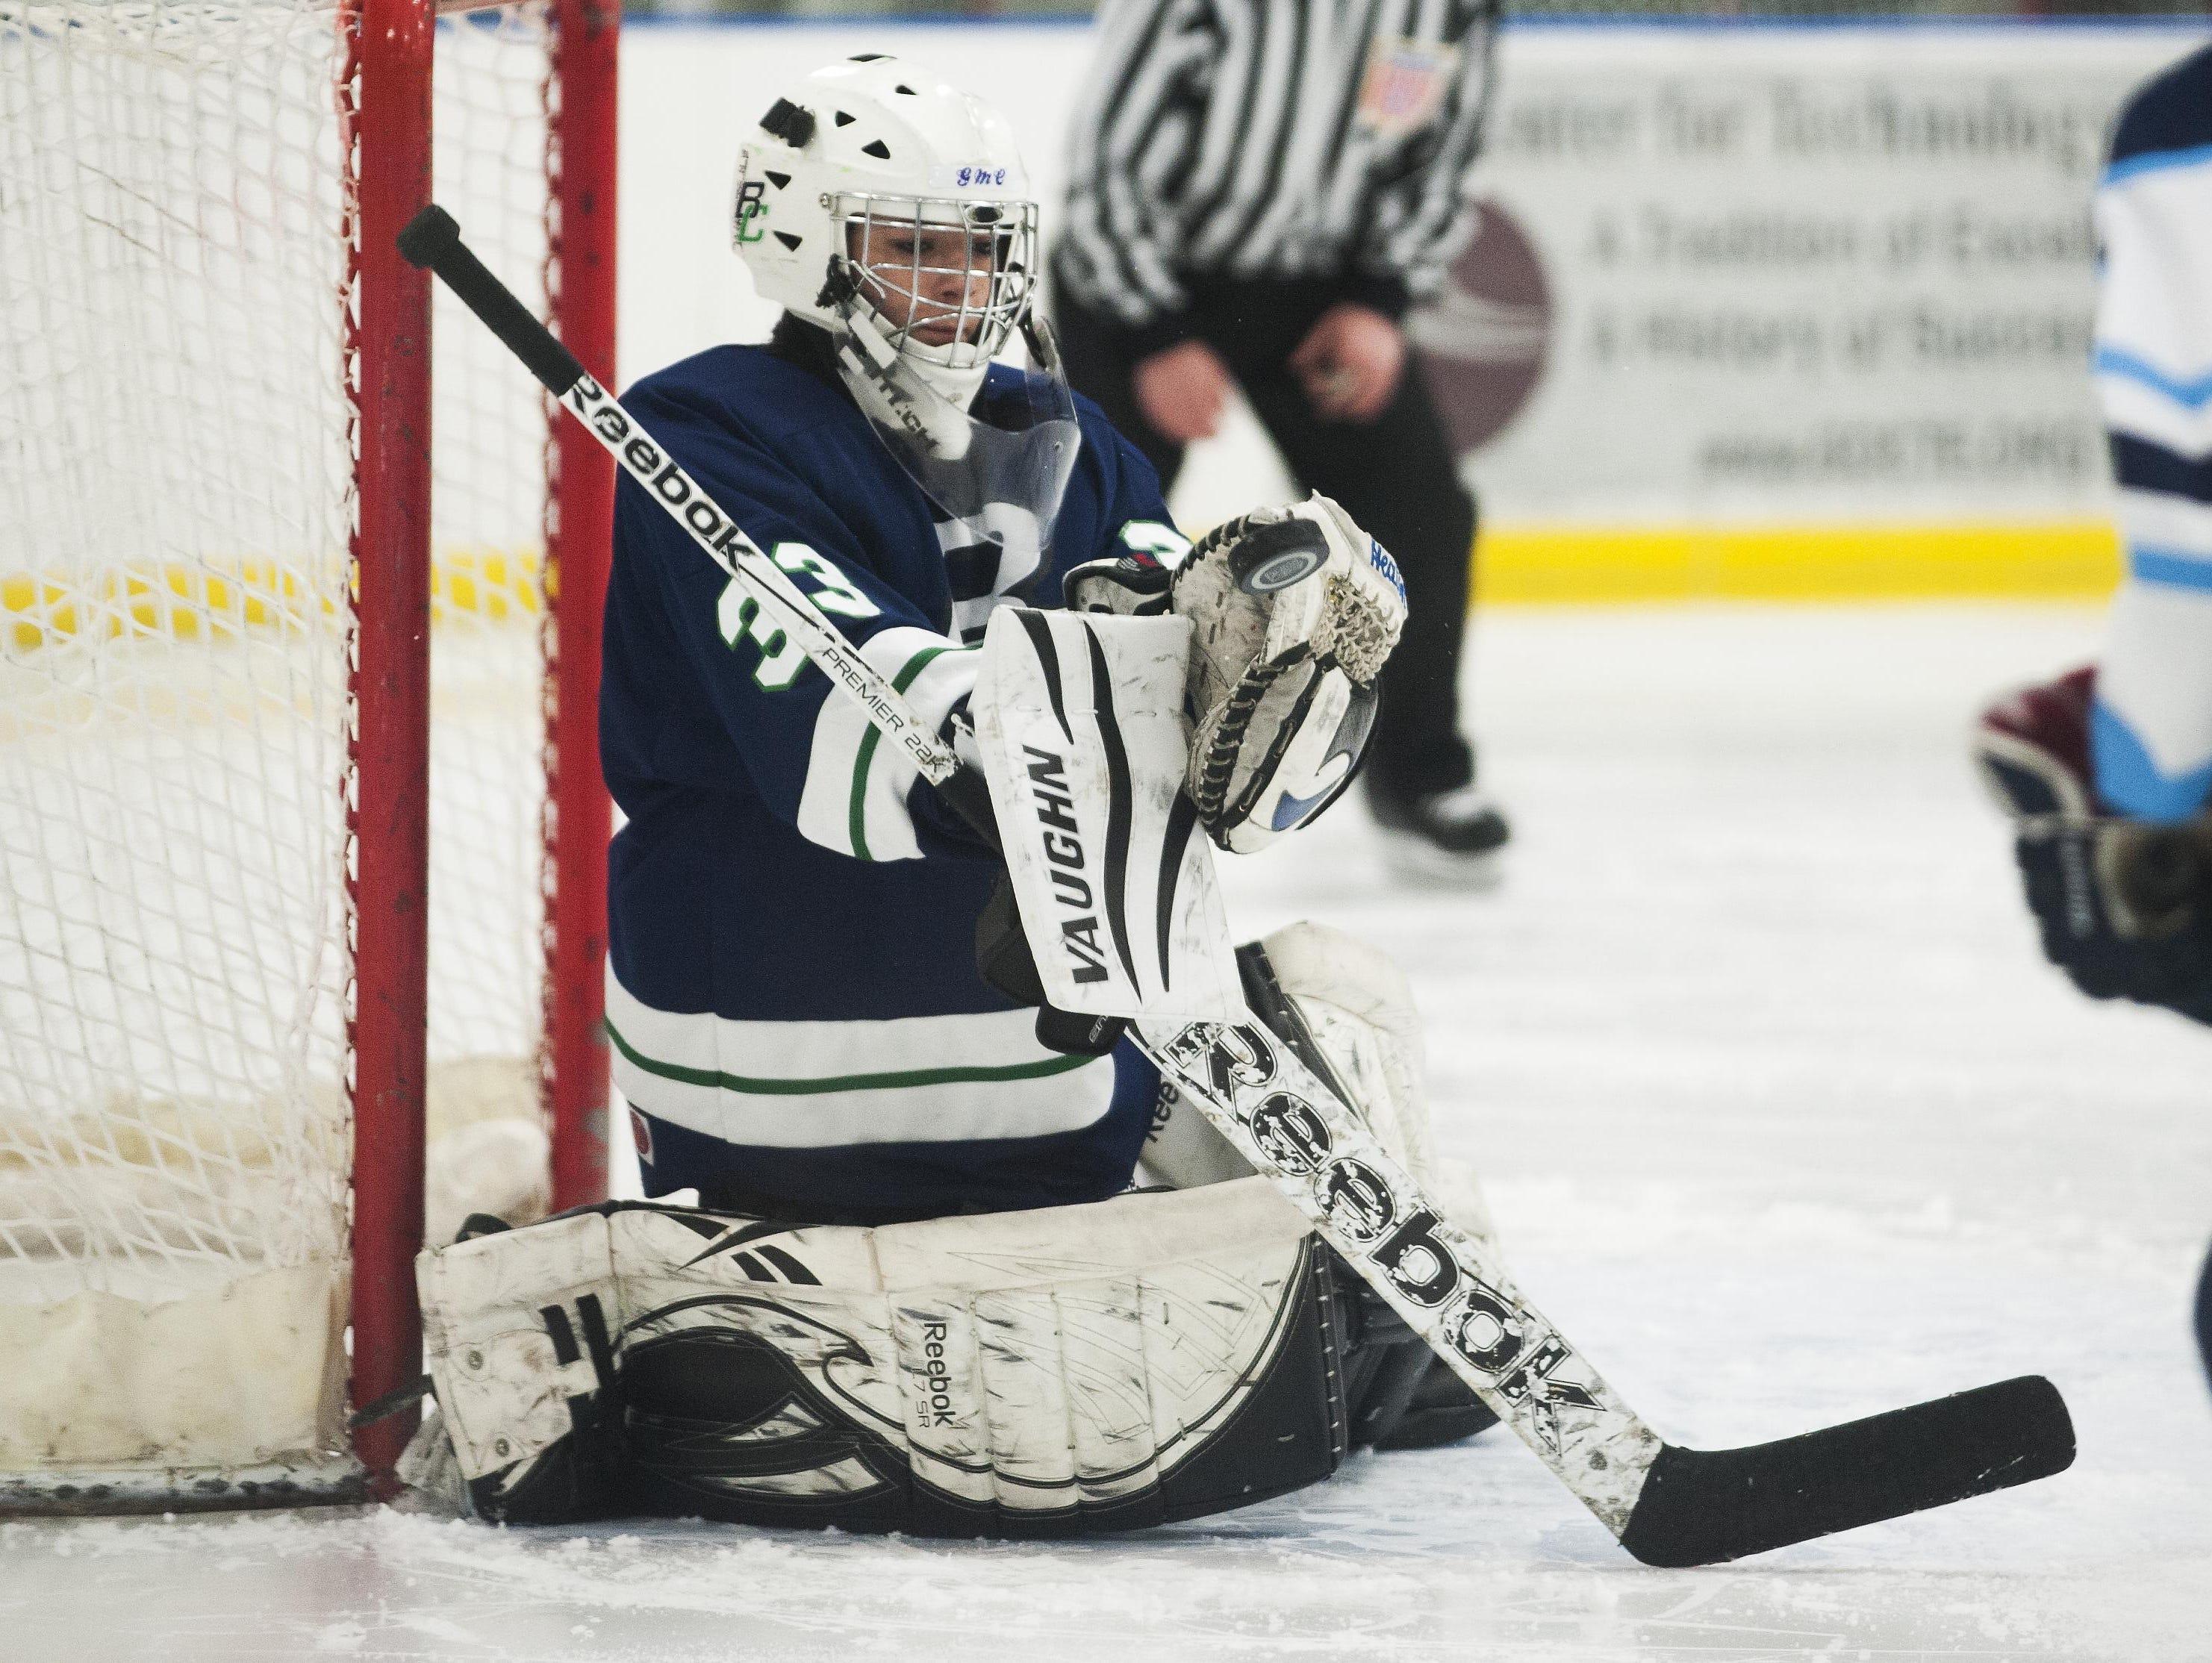 Burlington/Colchester goalie Jenna Blondin (33) makes a save during a girl playoff hockey game last season.